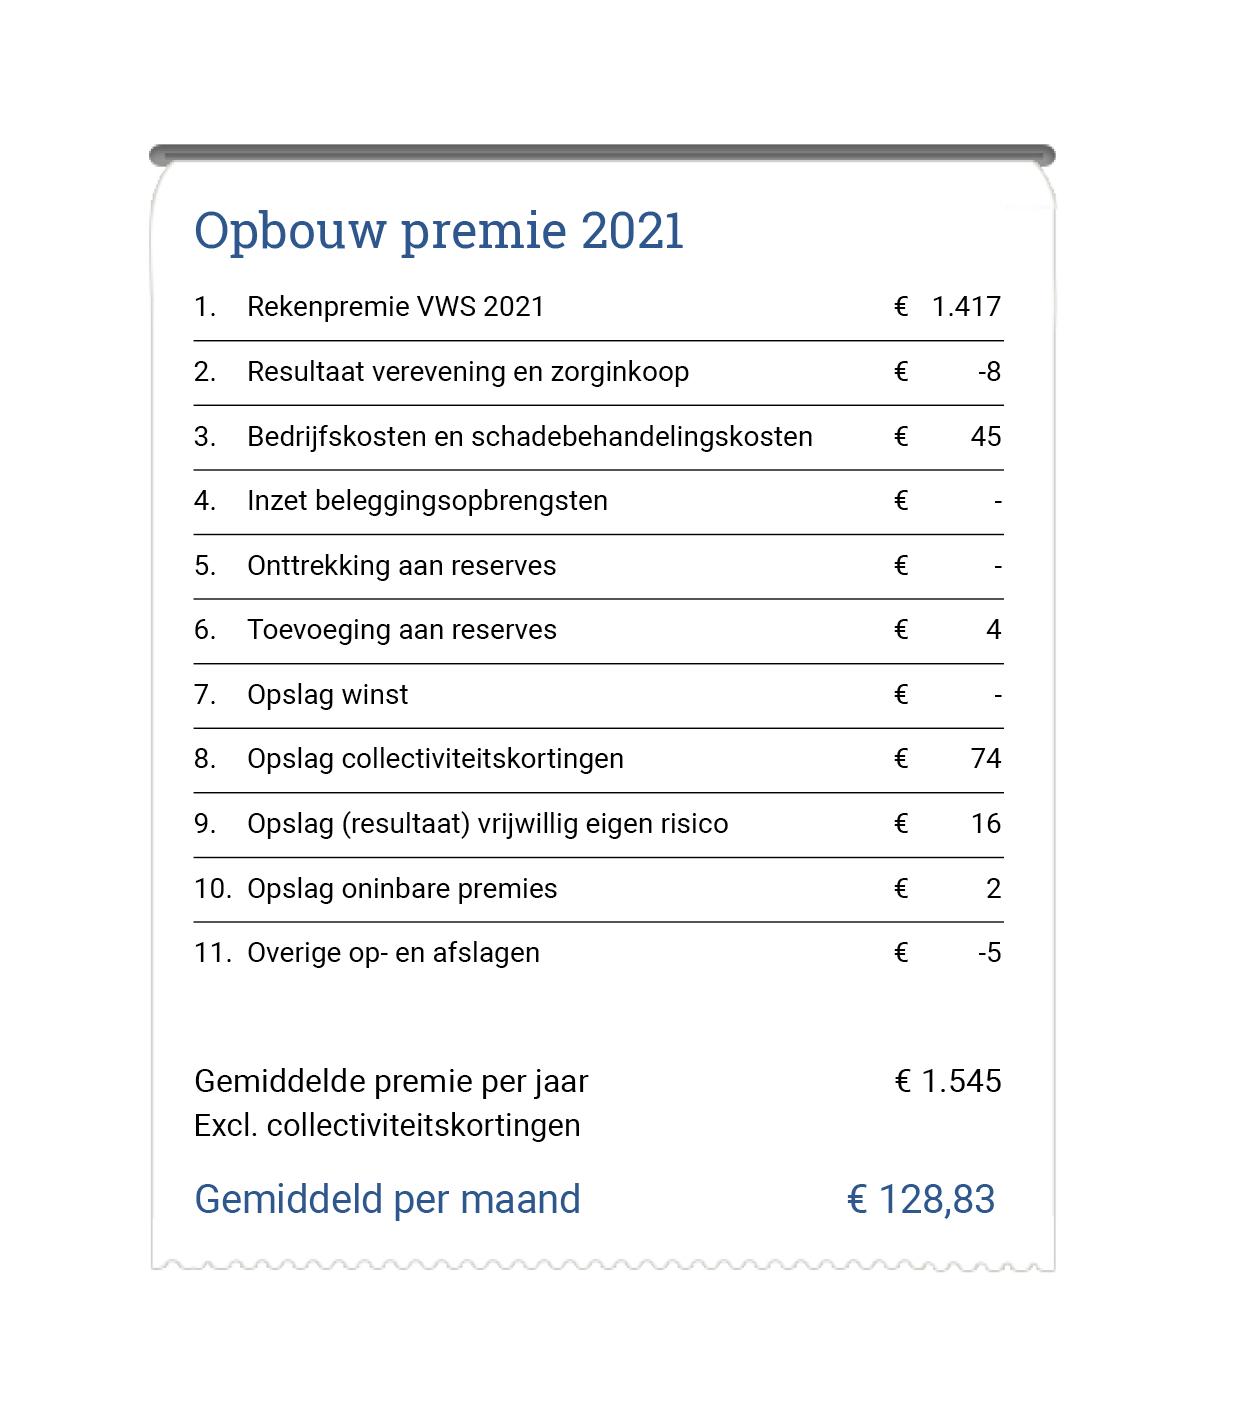 Opbouw premie 2021